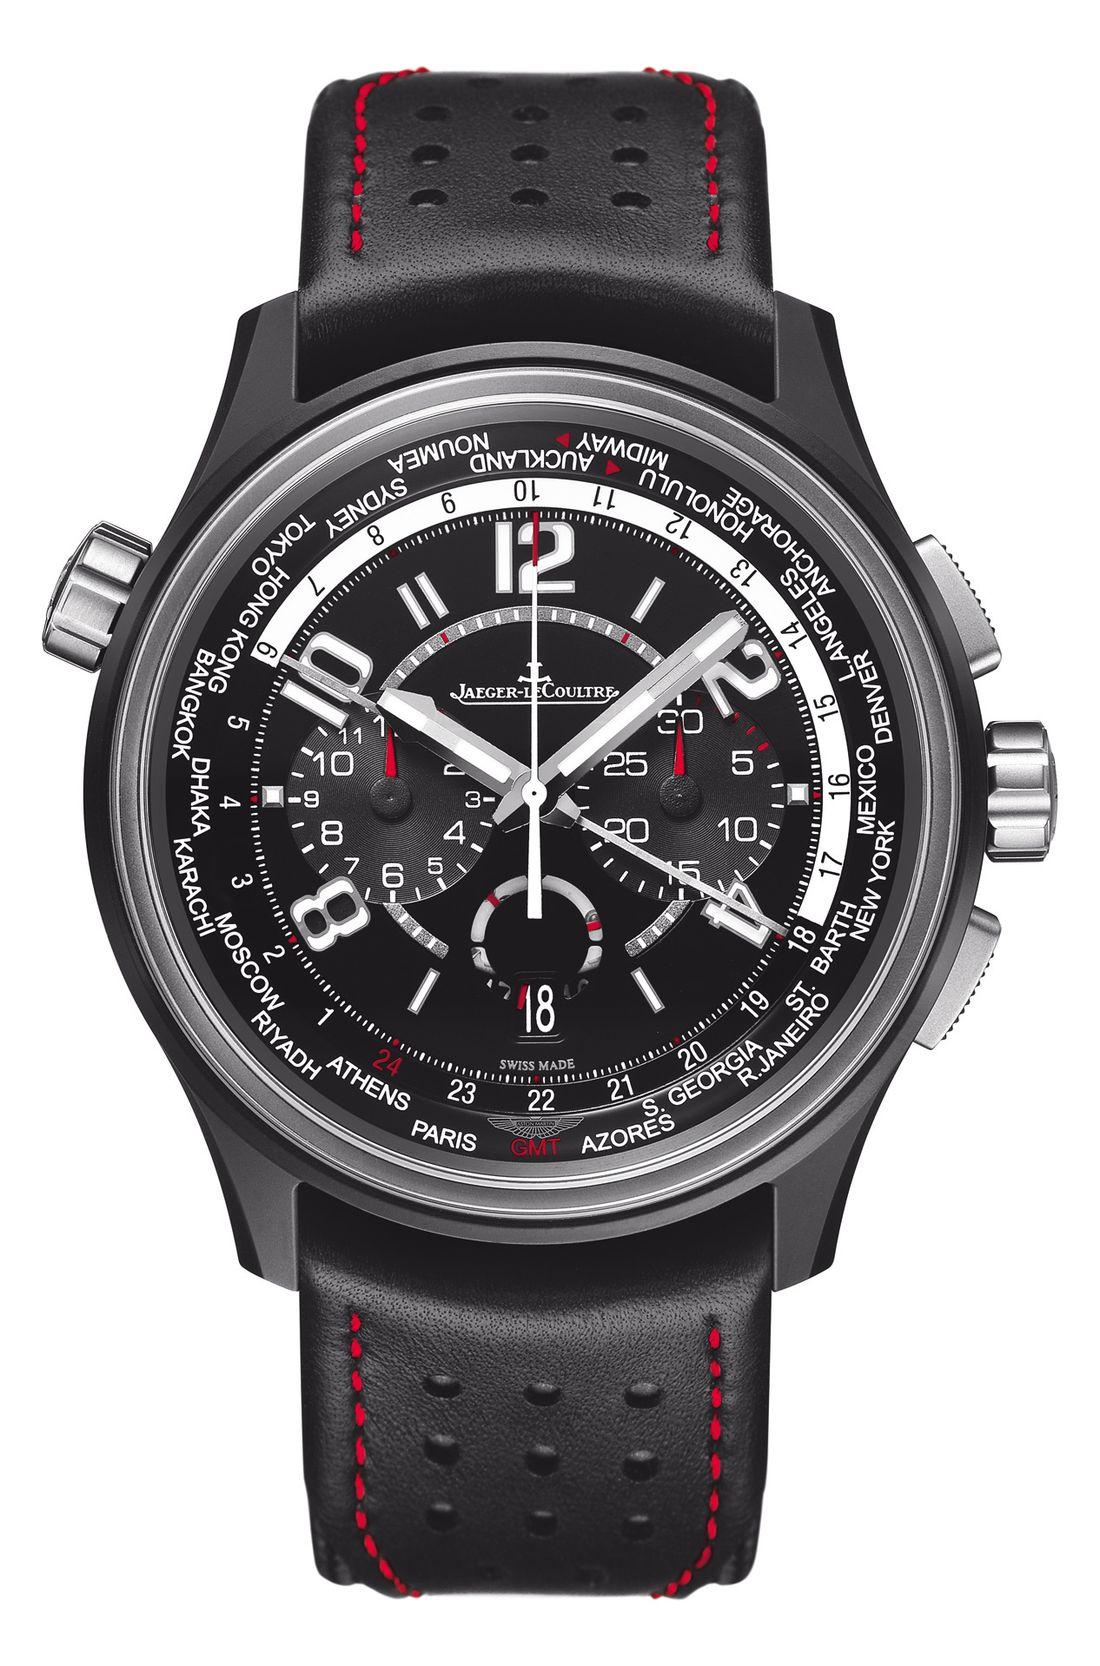 aston-martin-jaeger-lecoultre-montre_02